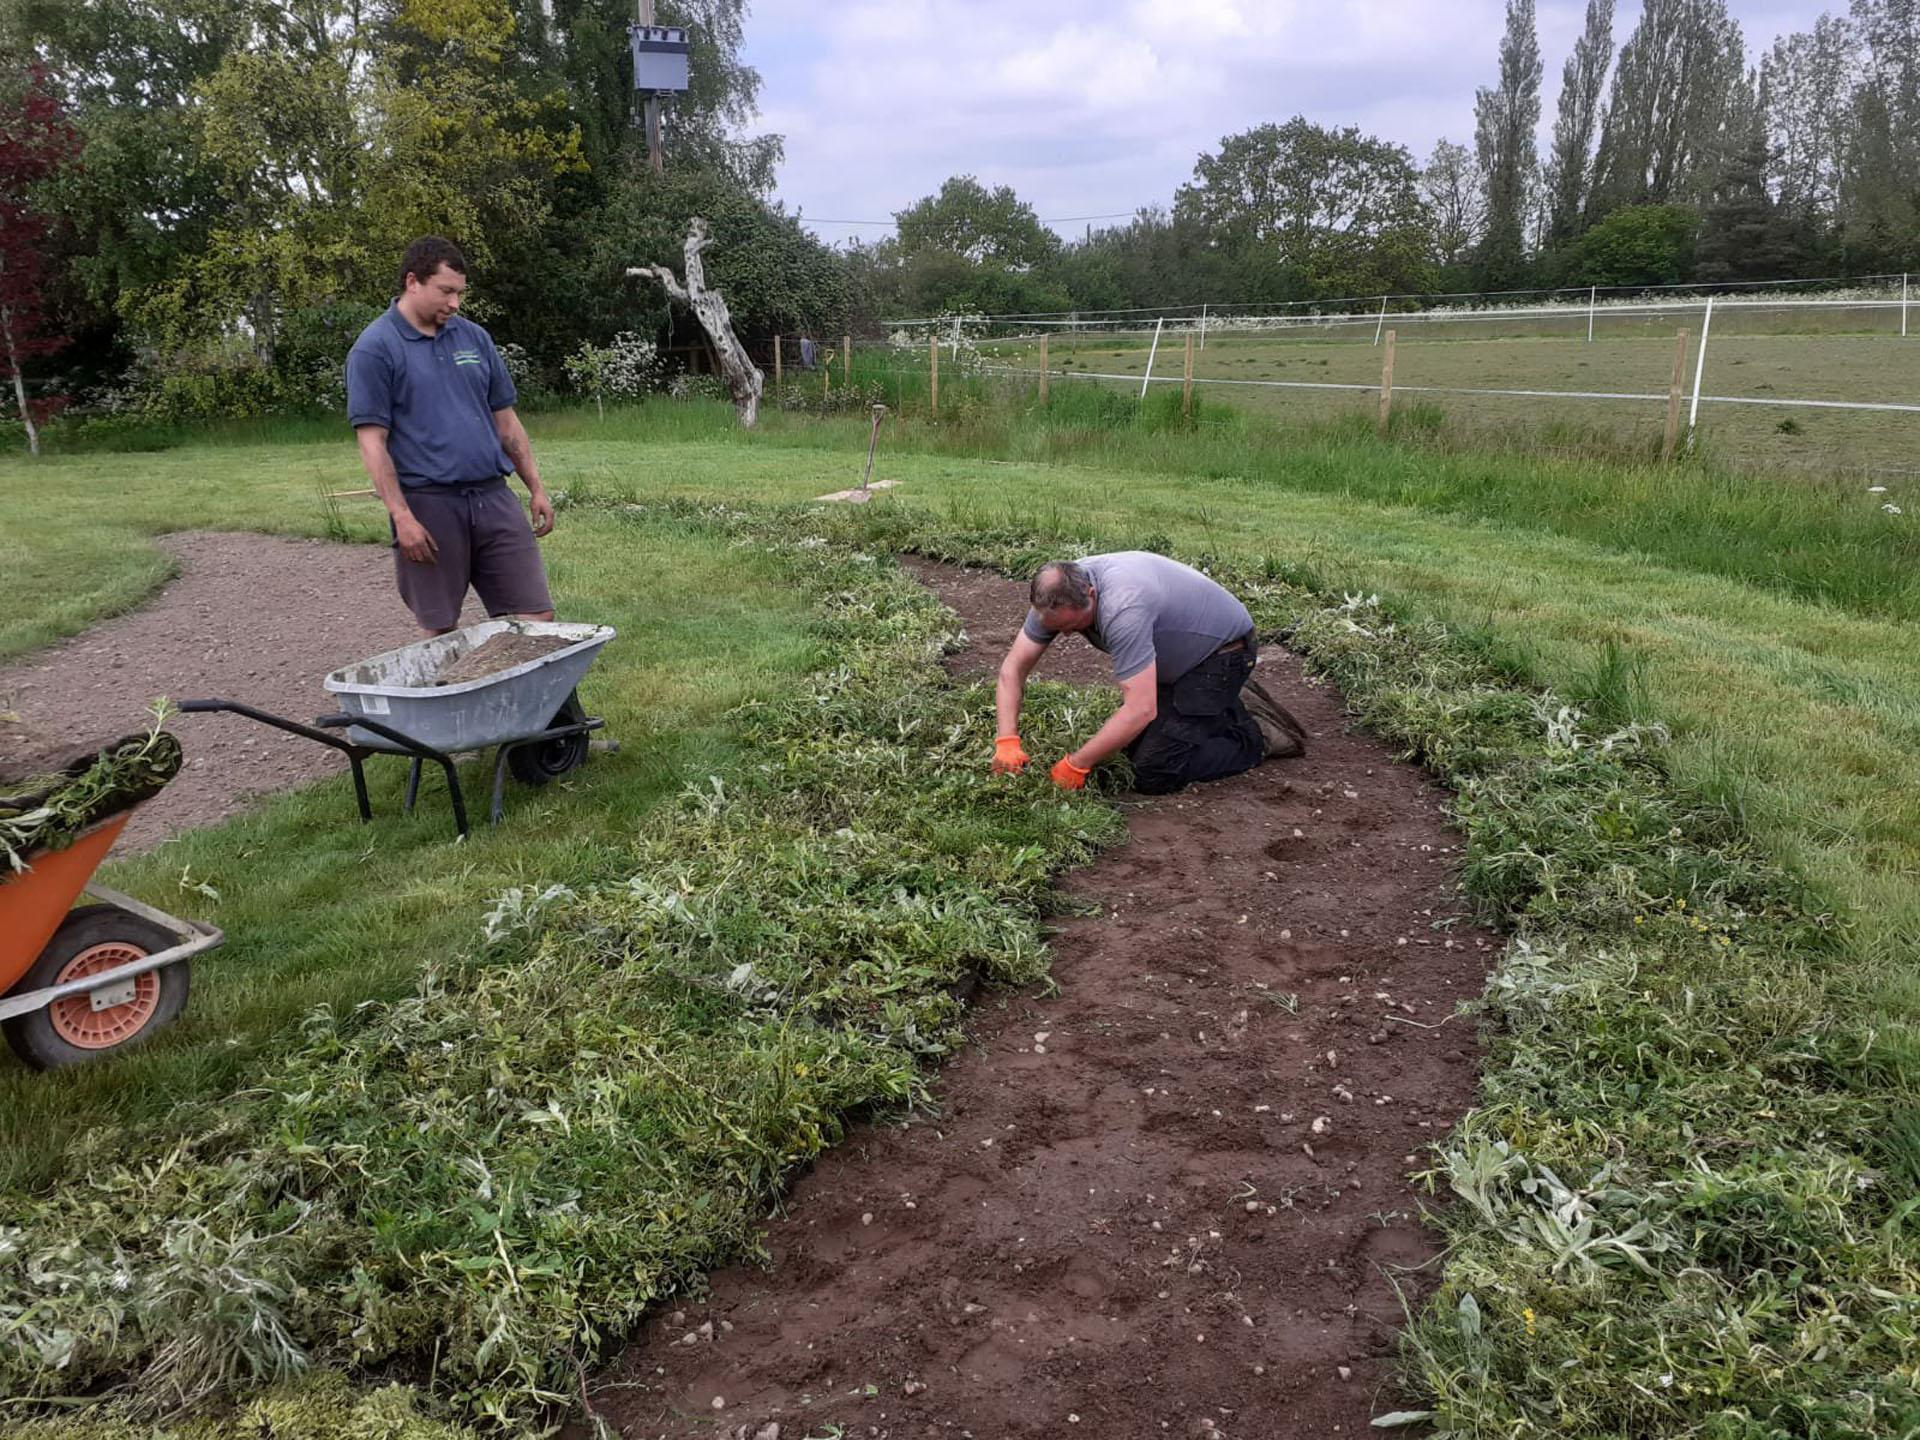 Team - Laying Crescent turf